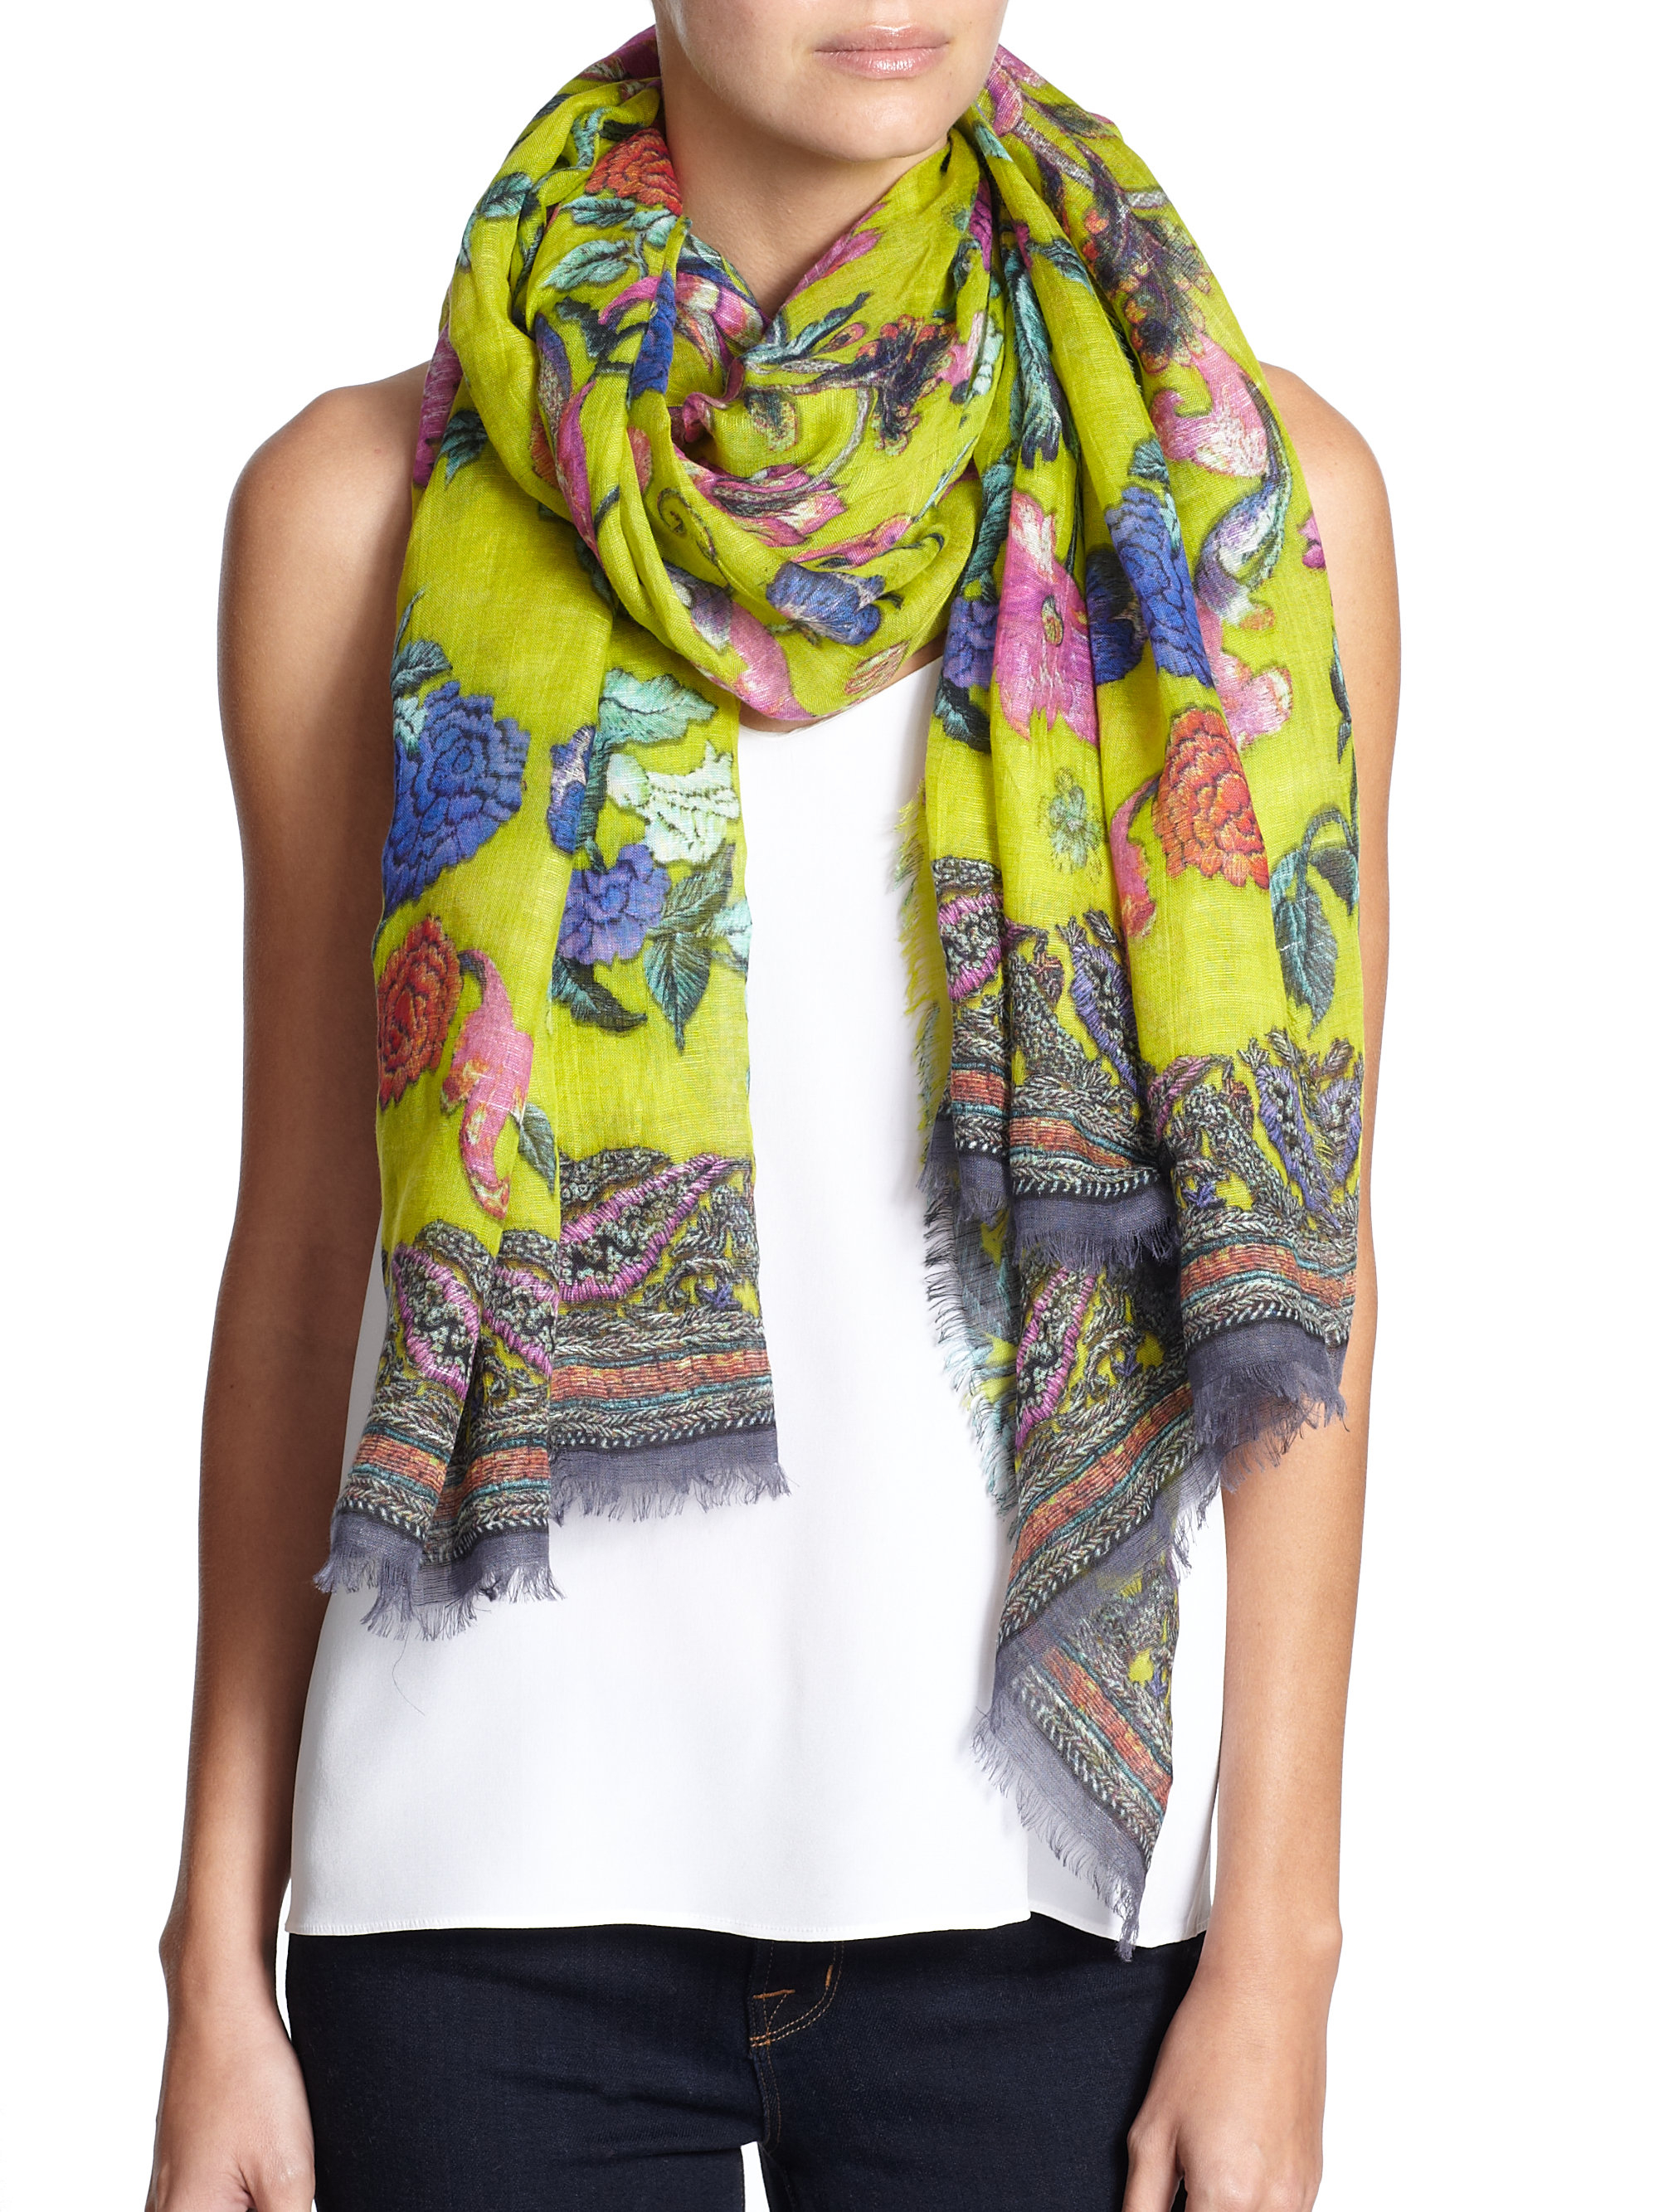 vase silk a modal l franco with ferrari scarves scarf design spring tilo lyst the graphic of